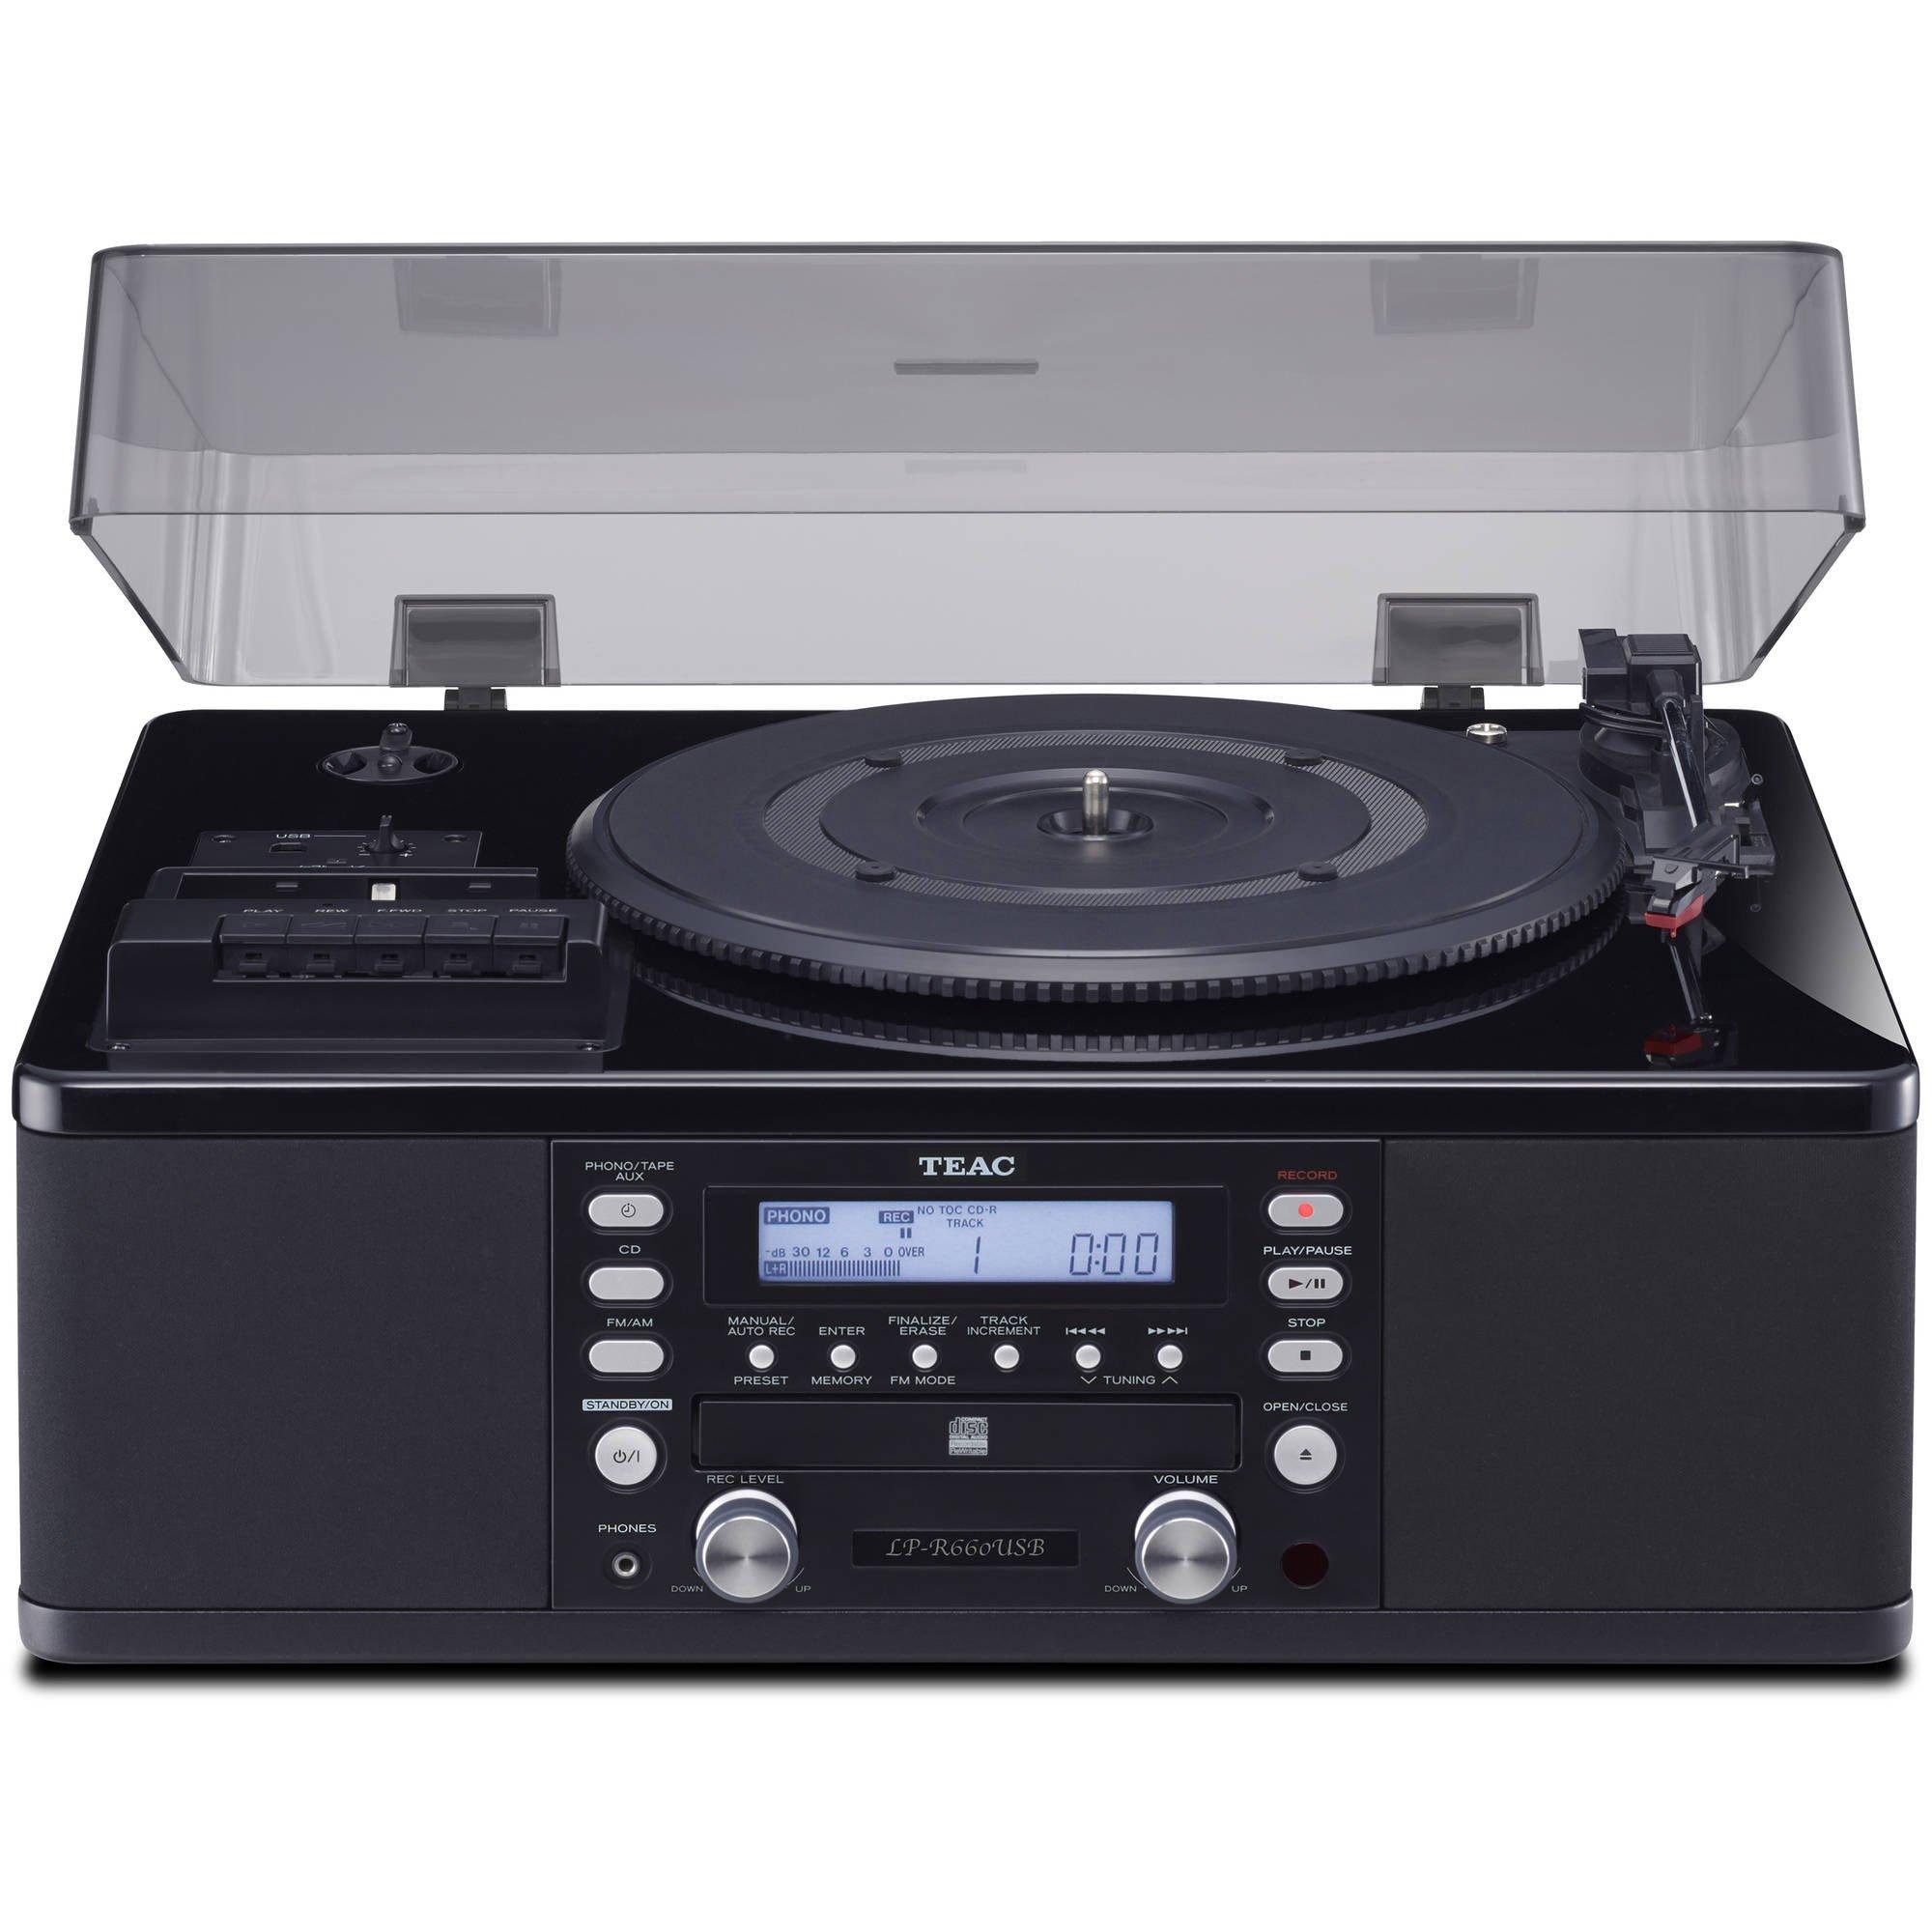 Teac LPR660USBPB LP-Cassette to CD Recorder/USB Home Theater Receiver, Black by Teac